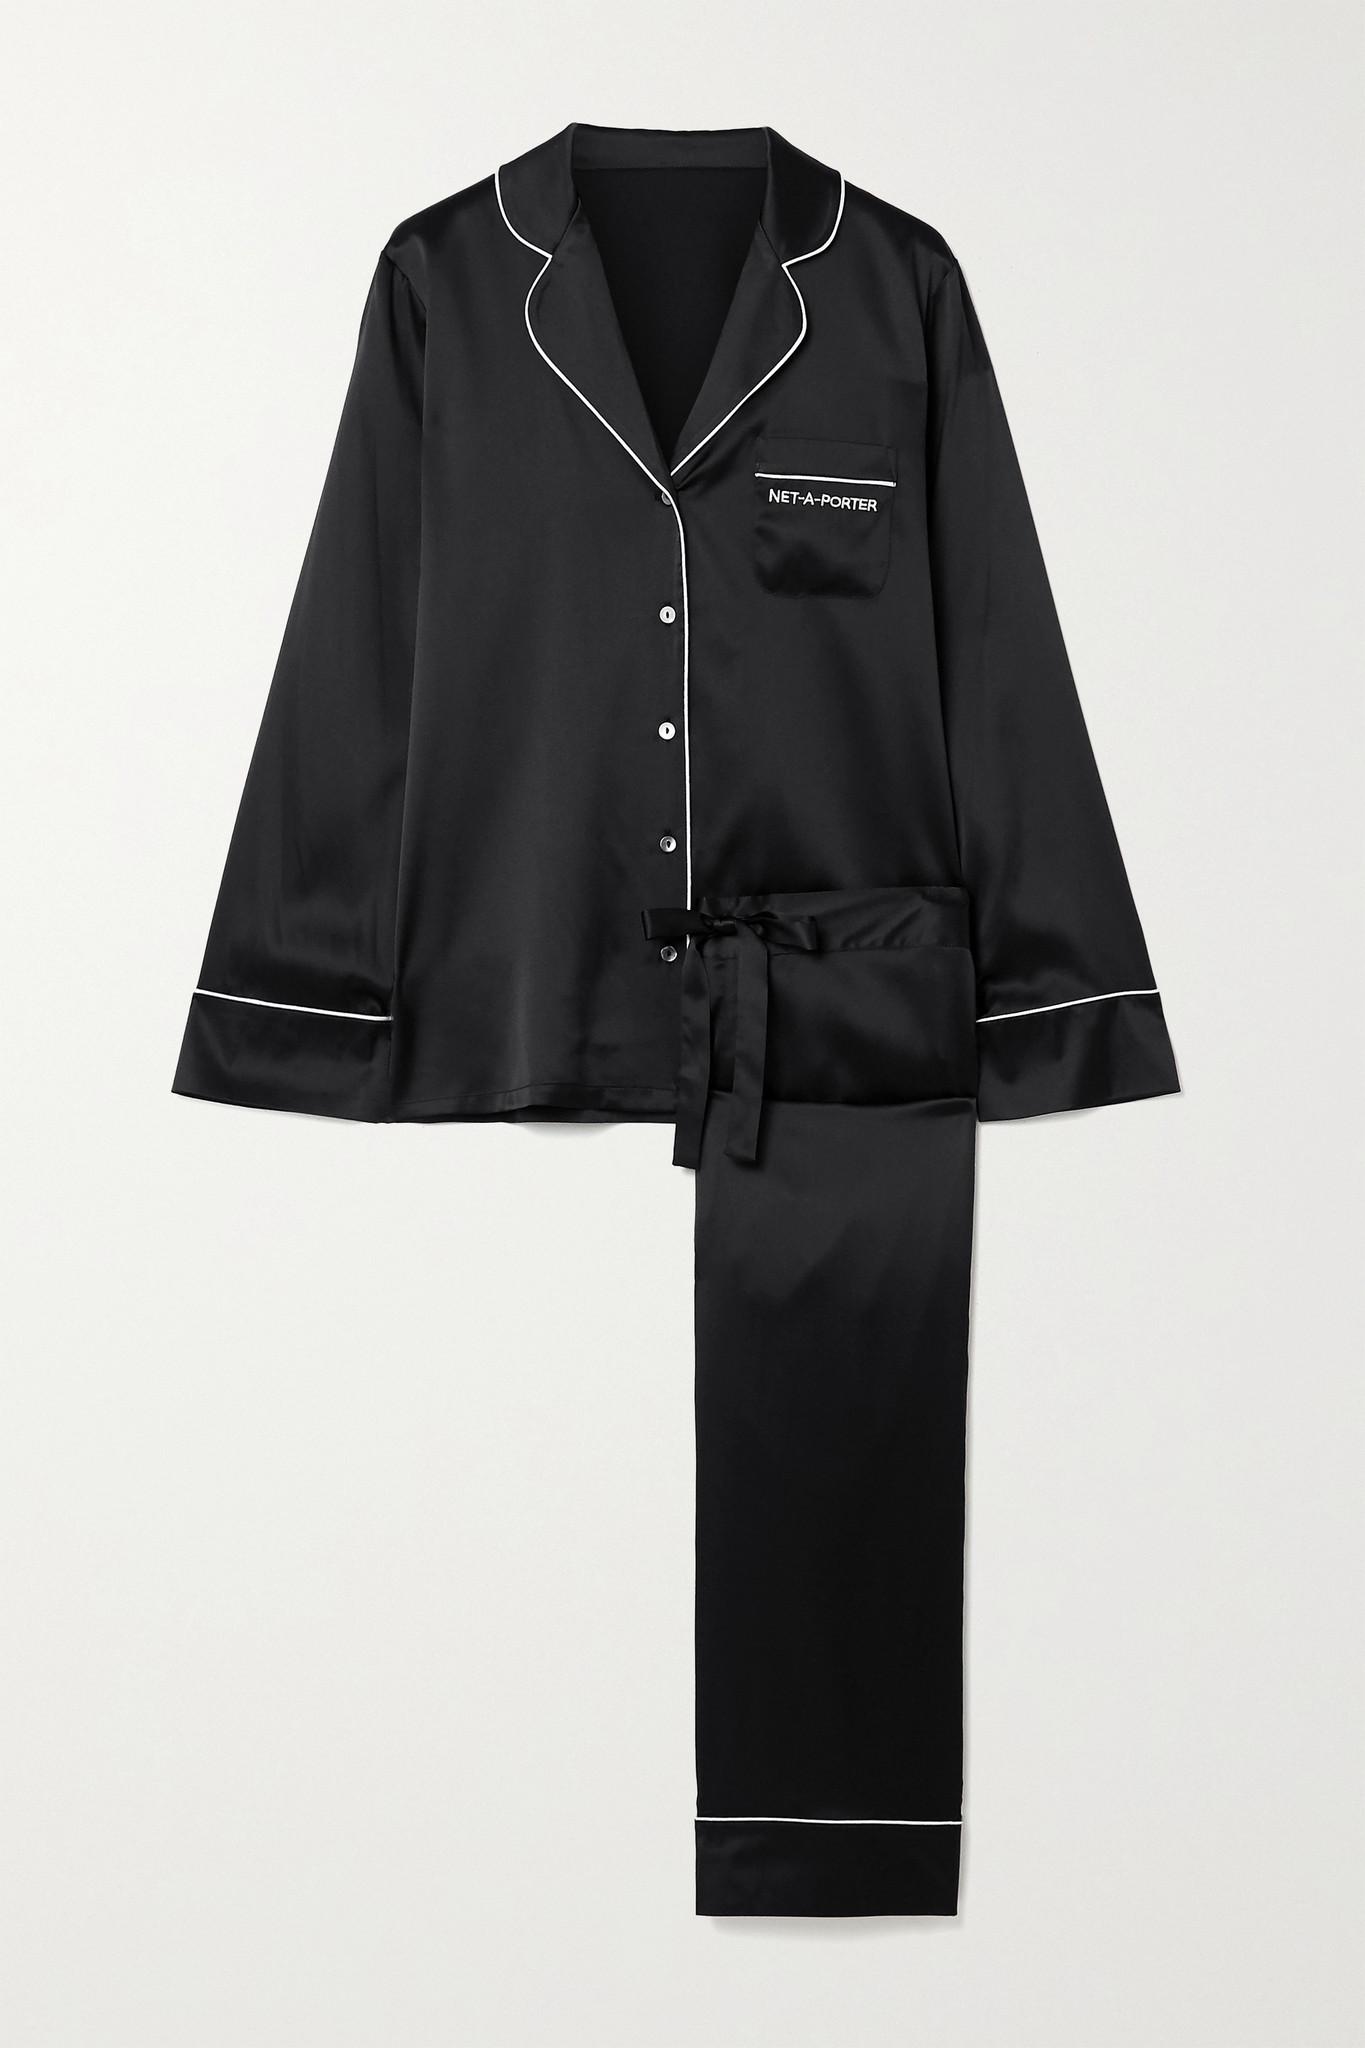 JOURNELLE - + Net-a-porter Embroidered Silk-blend Satin Pajama Set - Black - x small